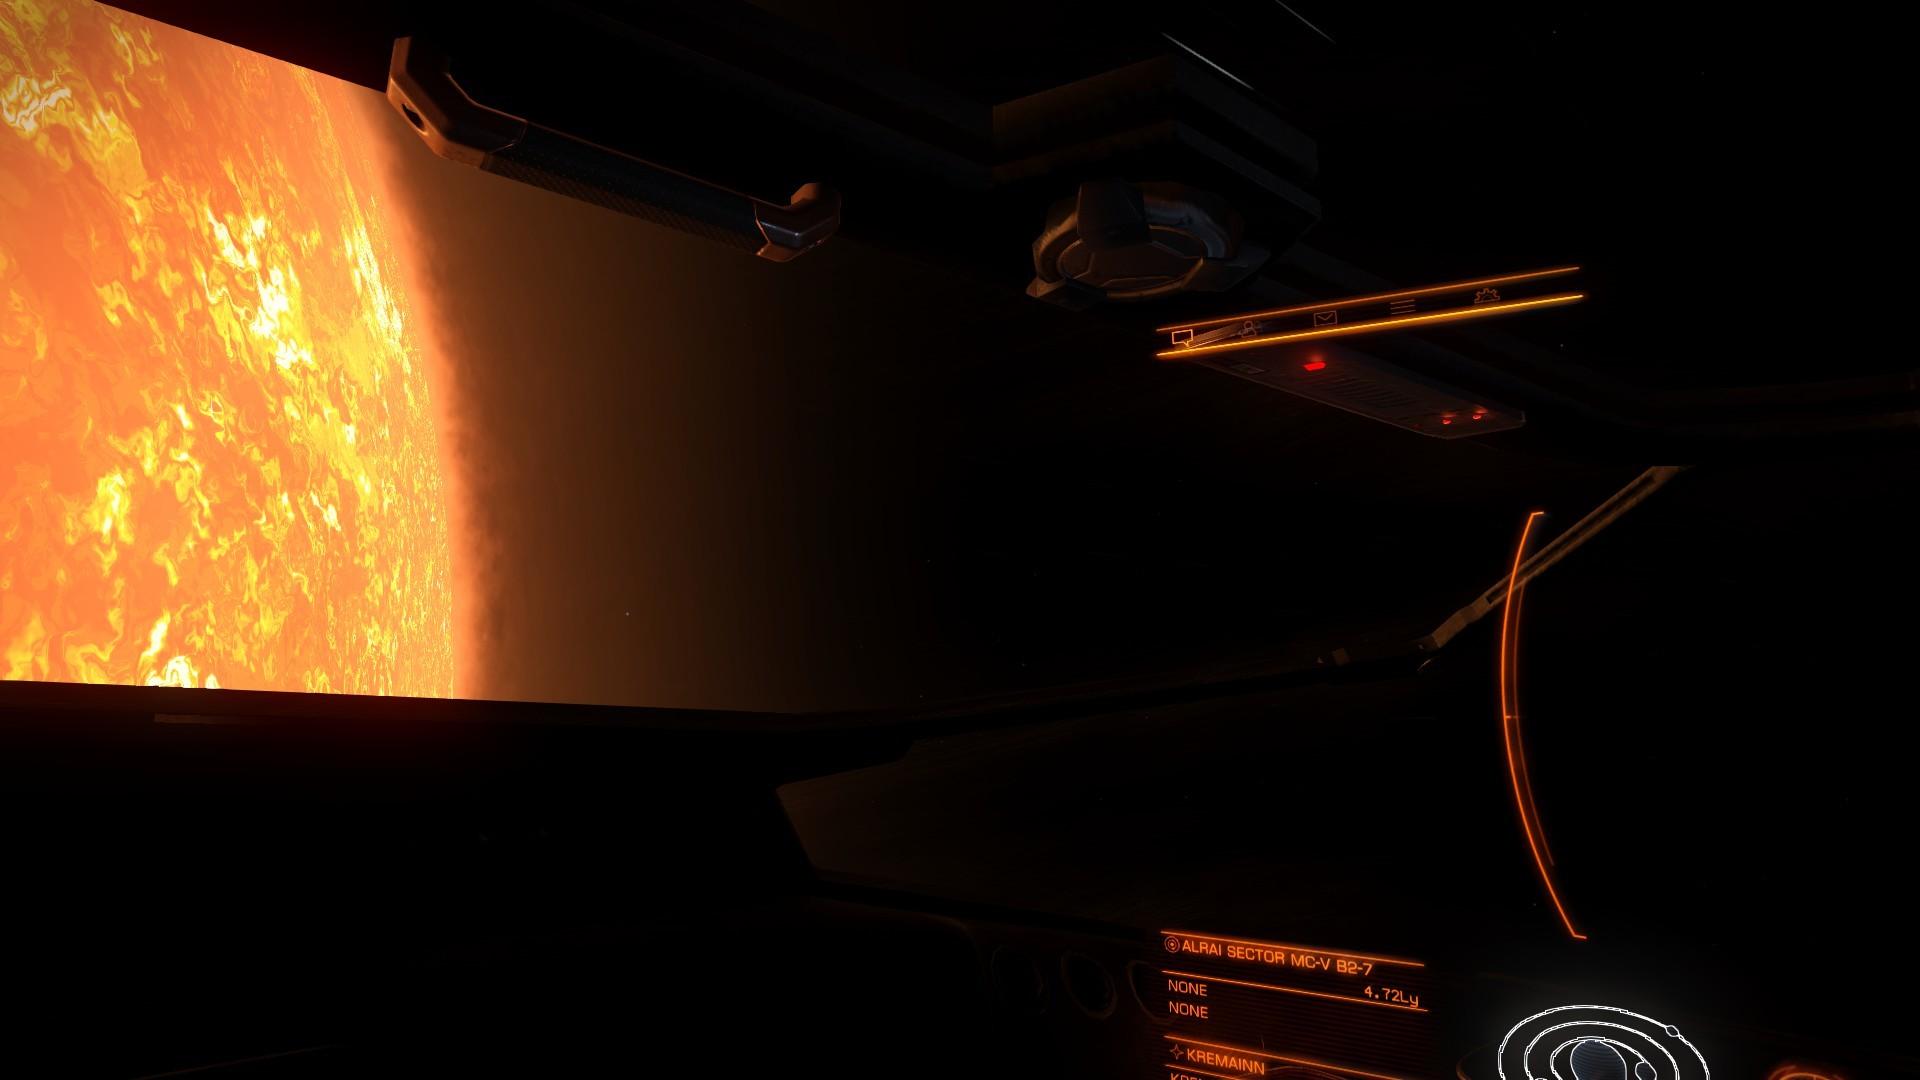 General 1920x1080 Elite: Dangerous space exploration video games first person